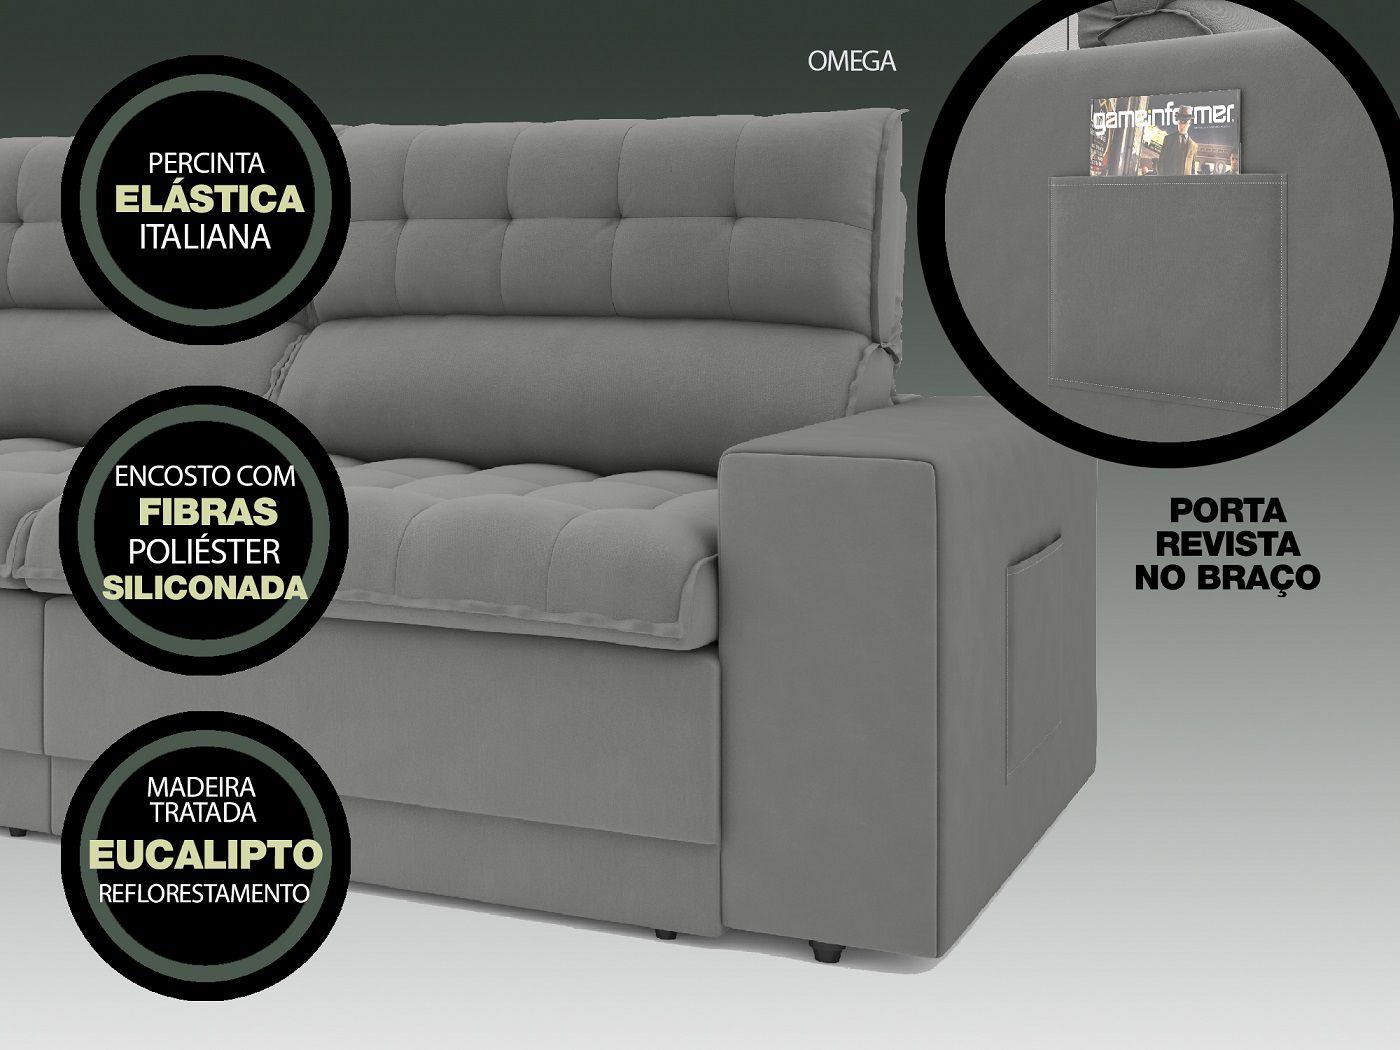 Sofá Omega 2,30m Assento Retrátil e Reclinável Velosuede Grafite - NETSOFAS  - NETSOFÁS